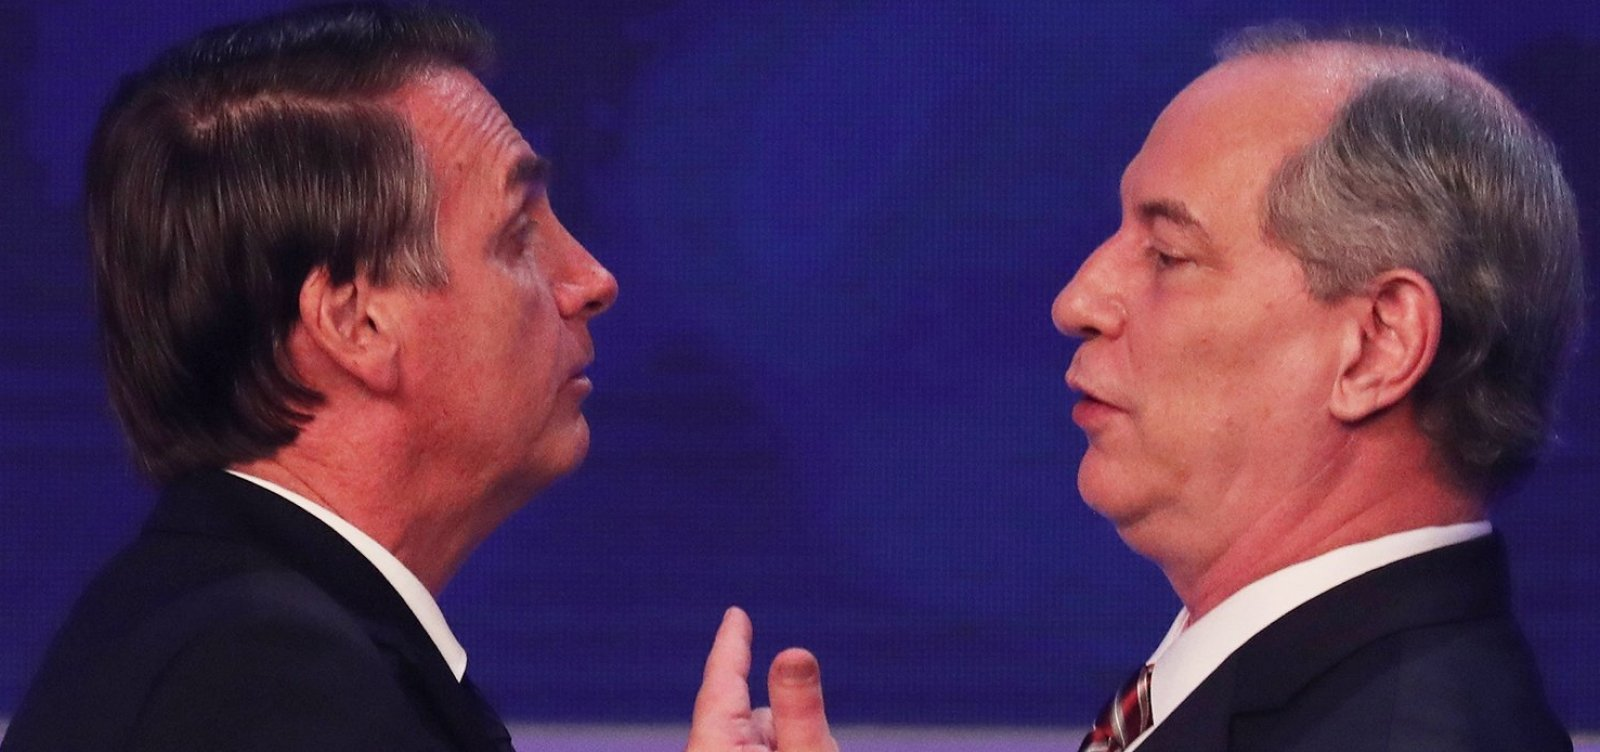 Ciro Gomes compartilha denúncia contra Bolsonaro